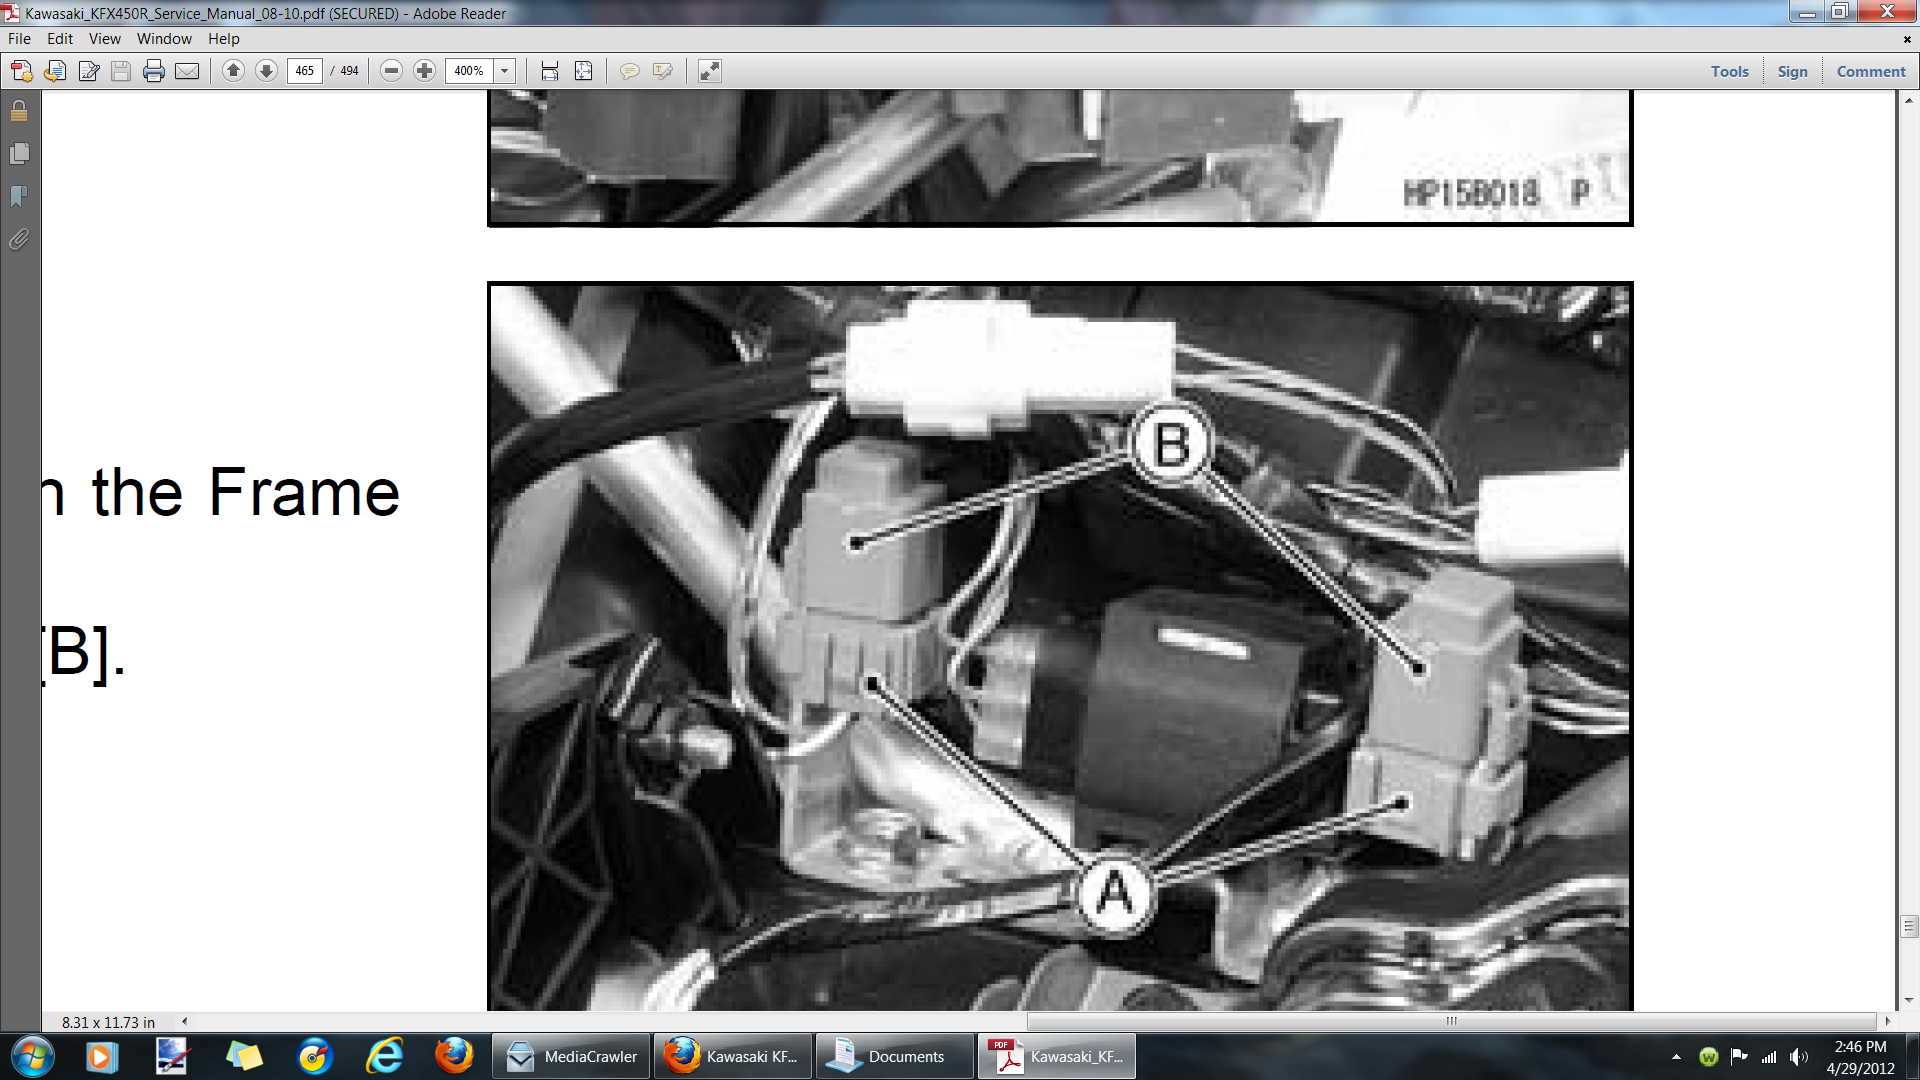 kawasaki kfx 450r forum wiring diagrams